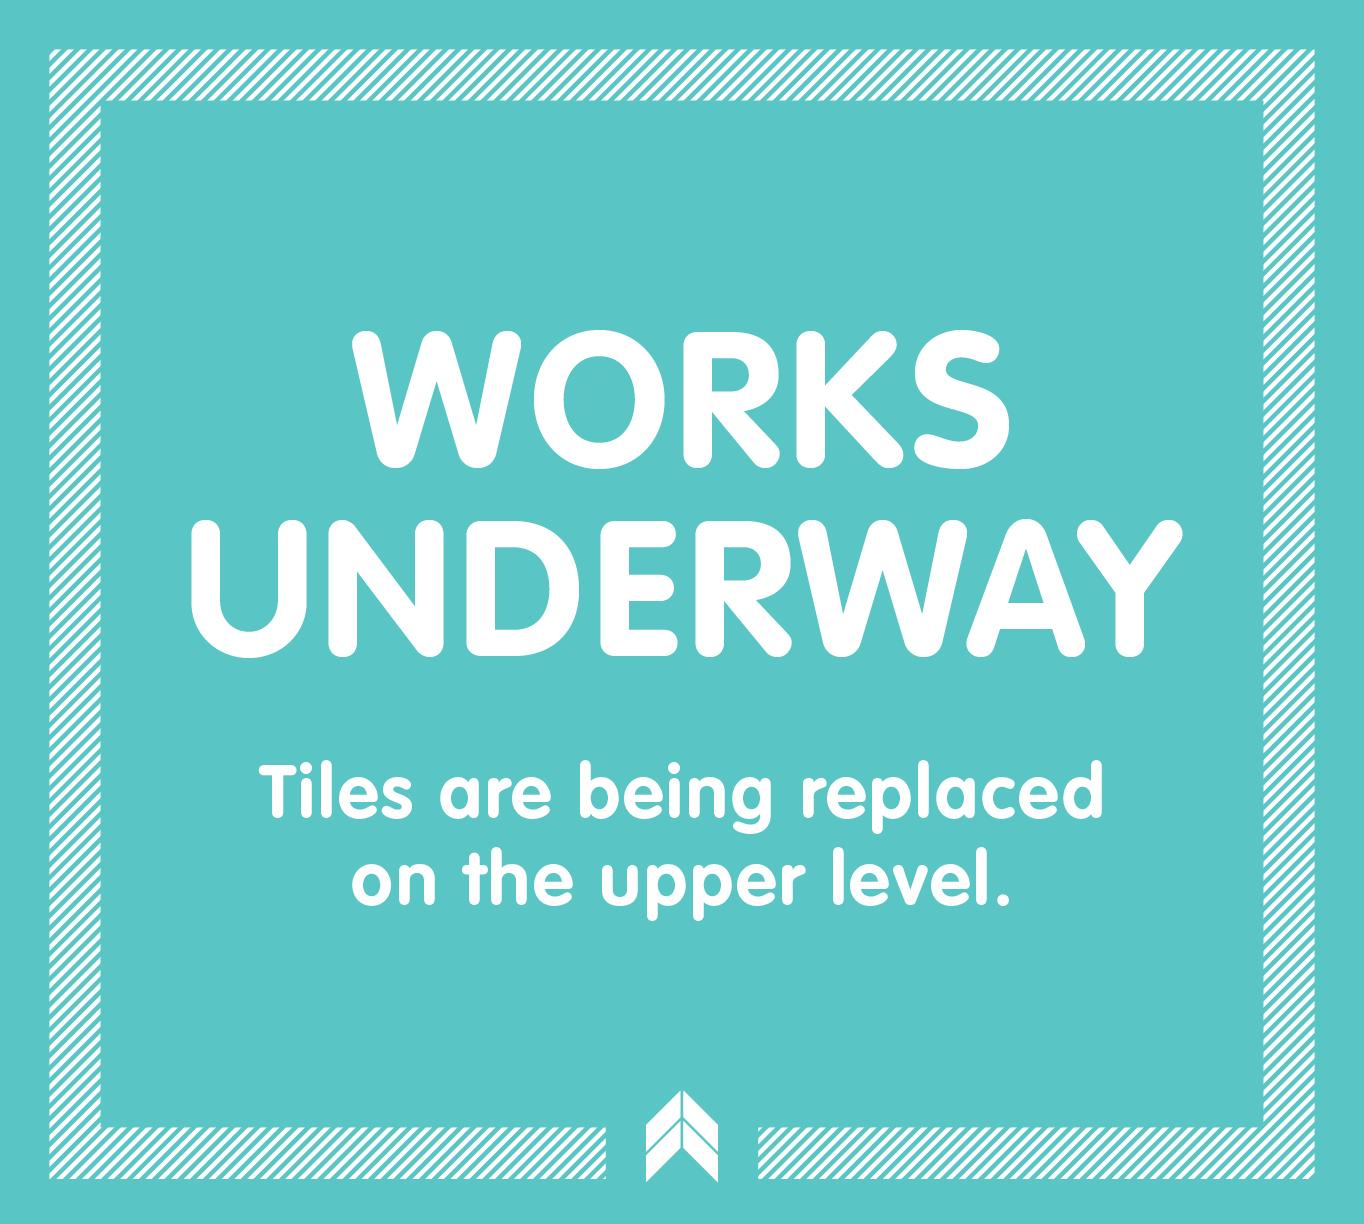 CH4621_CTM_Works Web Tiles_682x612px